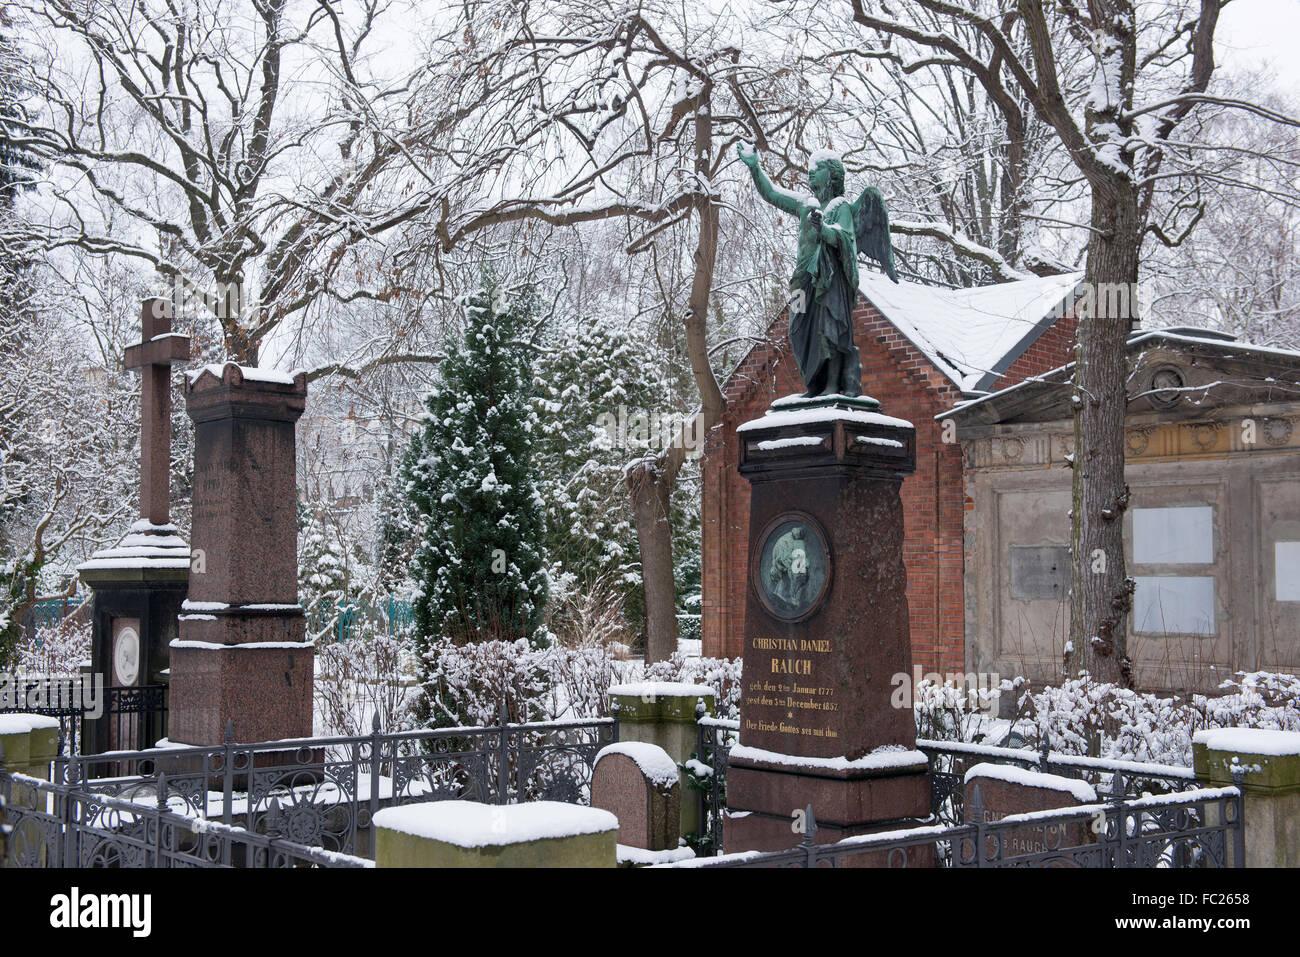 Dorotheenstadt cemetery Berlin, grave of Daniel Rauch, Germany - Stock Image